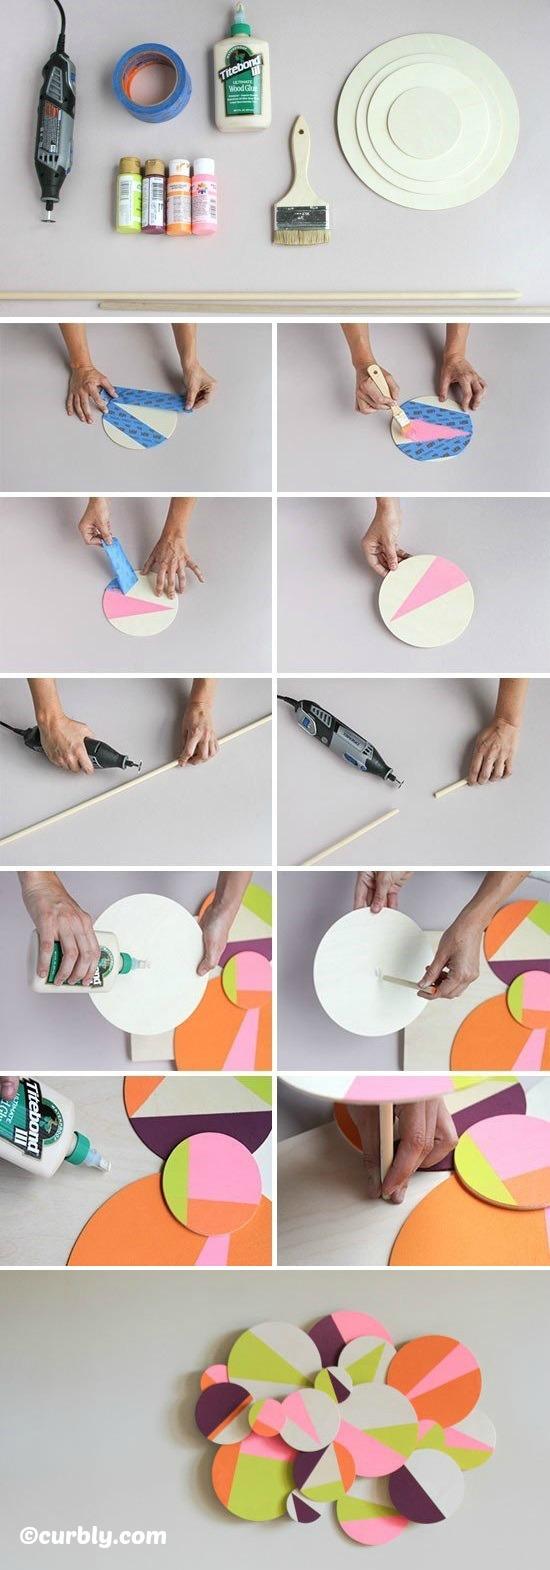 How to make 3D Geometric Wall Art